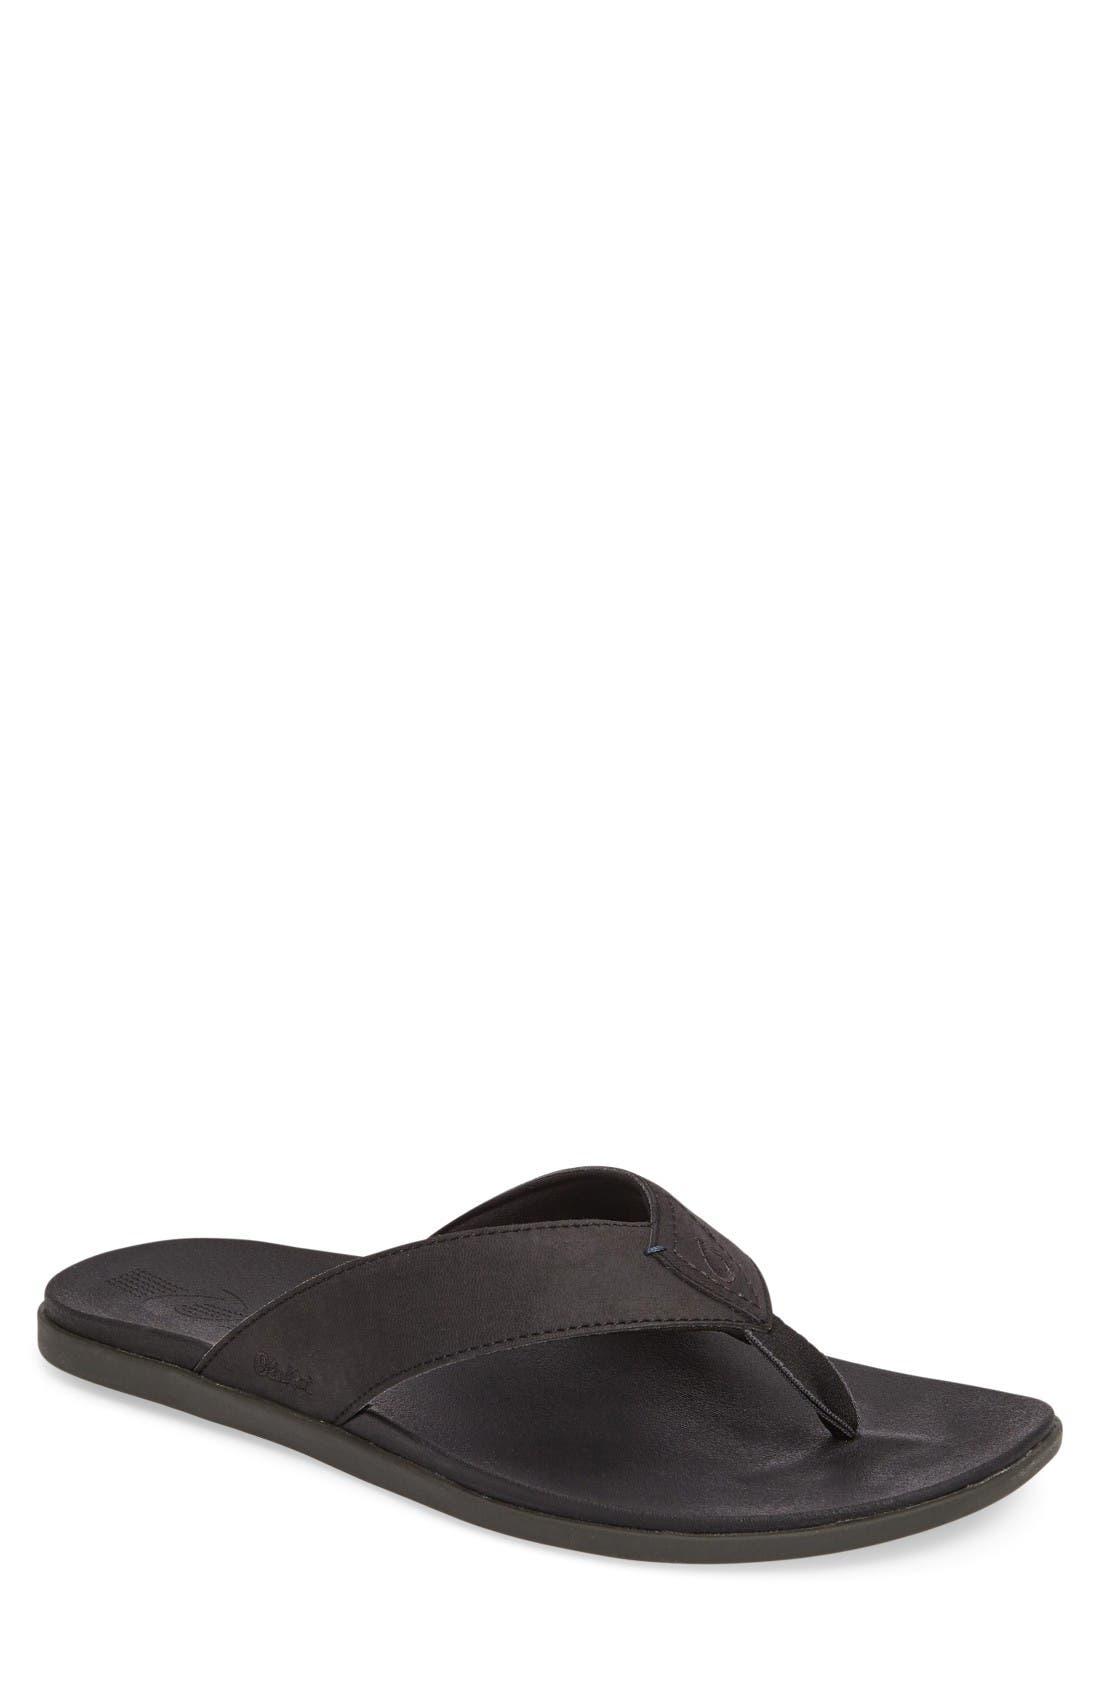 'Holona' Flip Flop,                         Main,                         color, Onyx/ Onyx